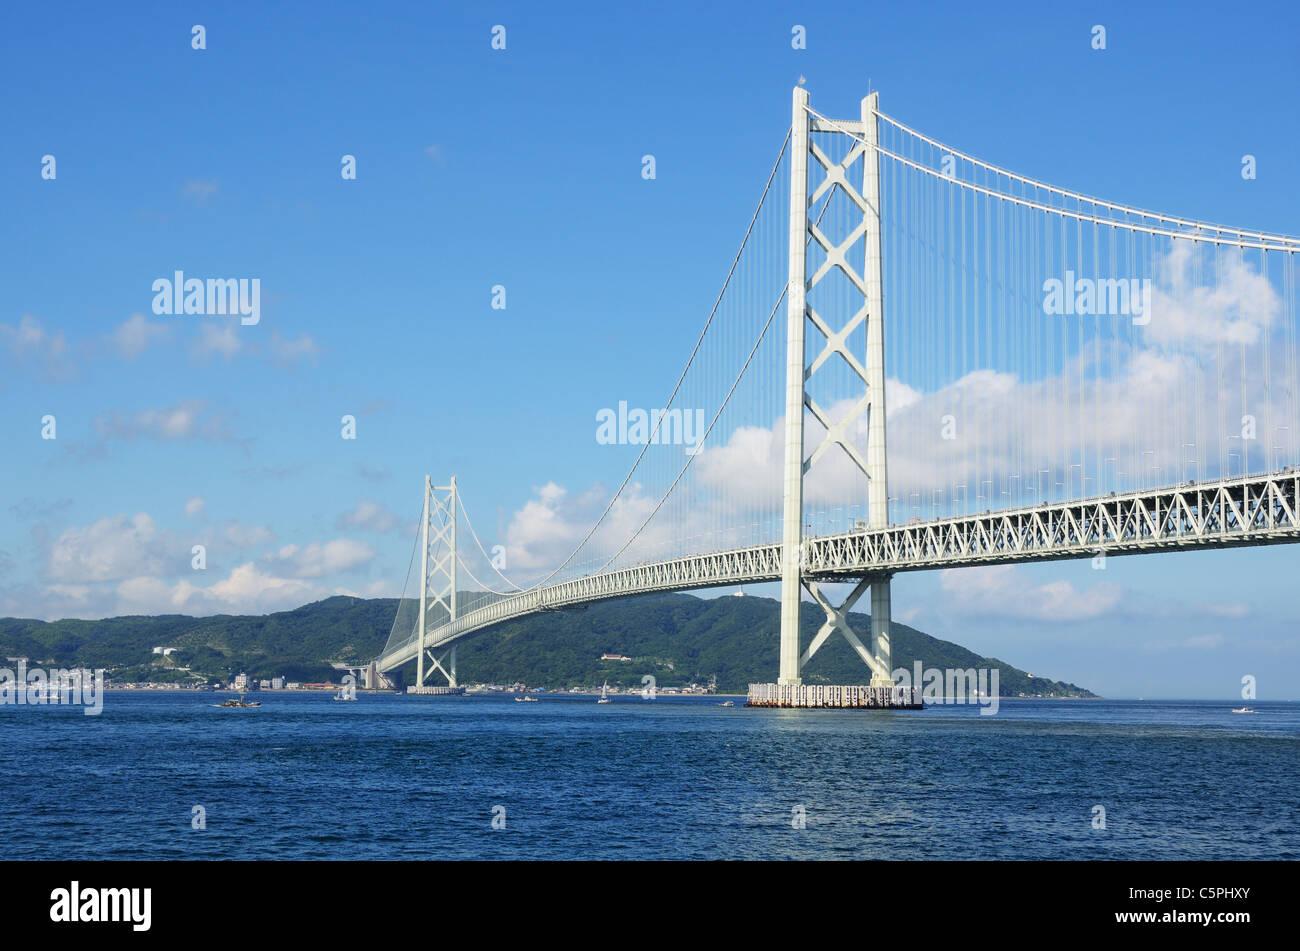 Puente Akashi Kaikyo en Kobe, Japón. Foto de stock